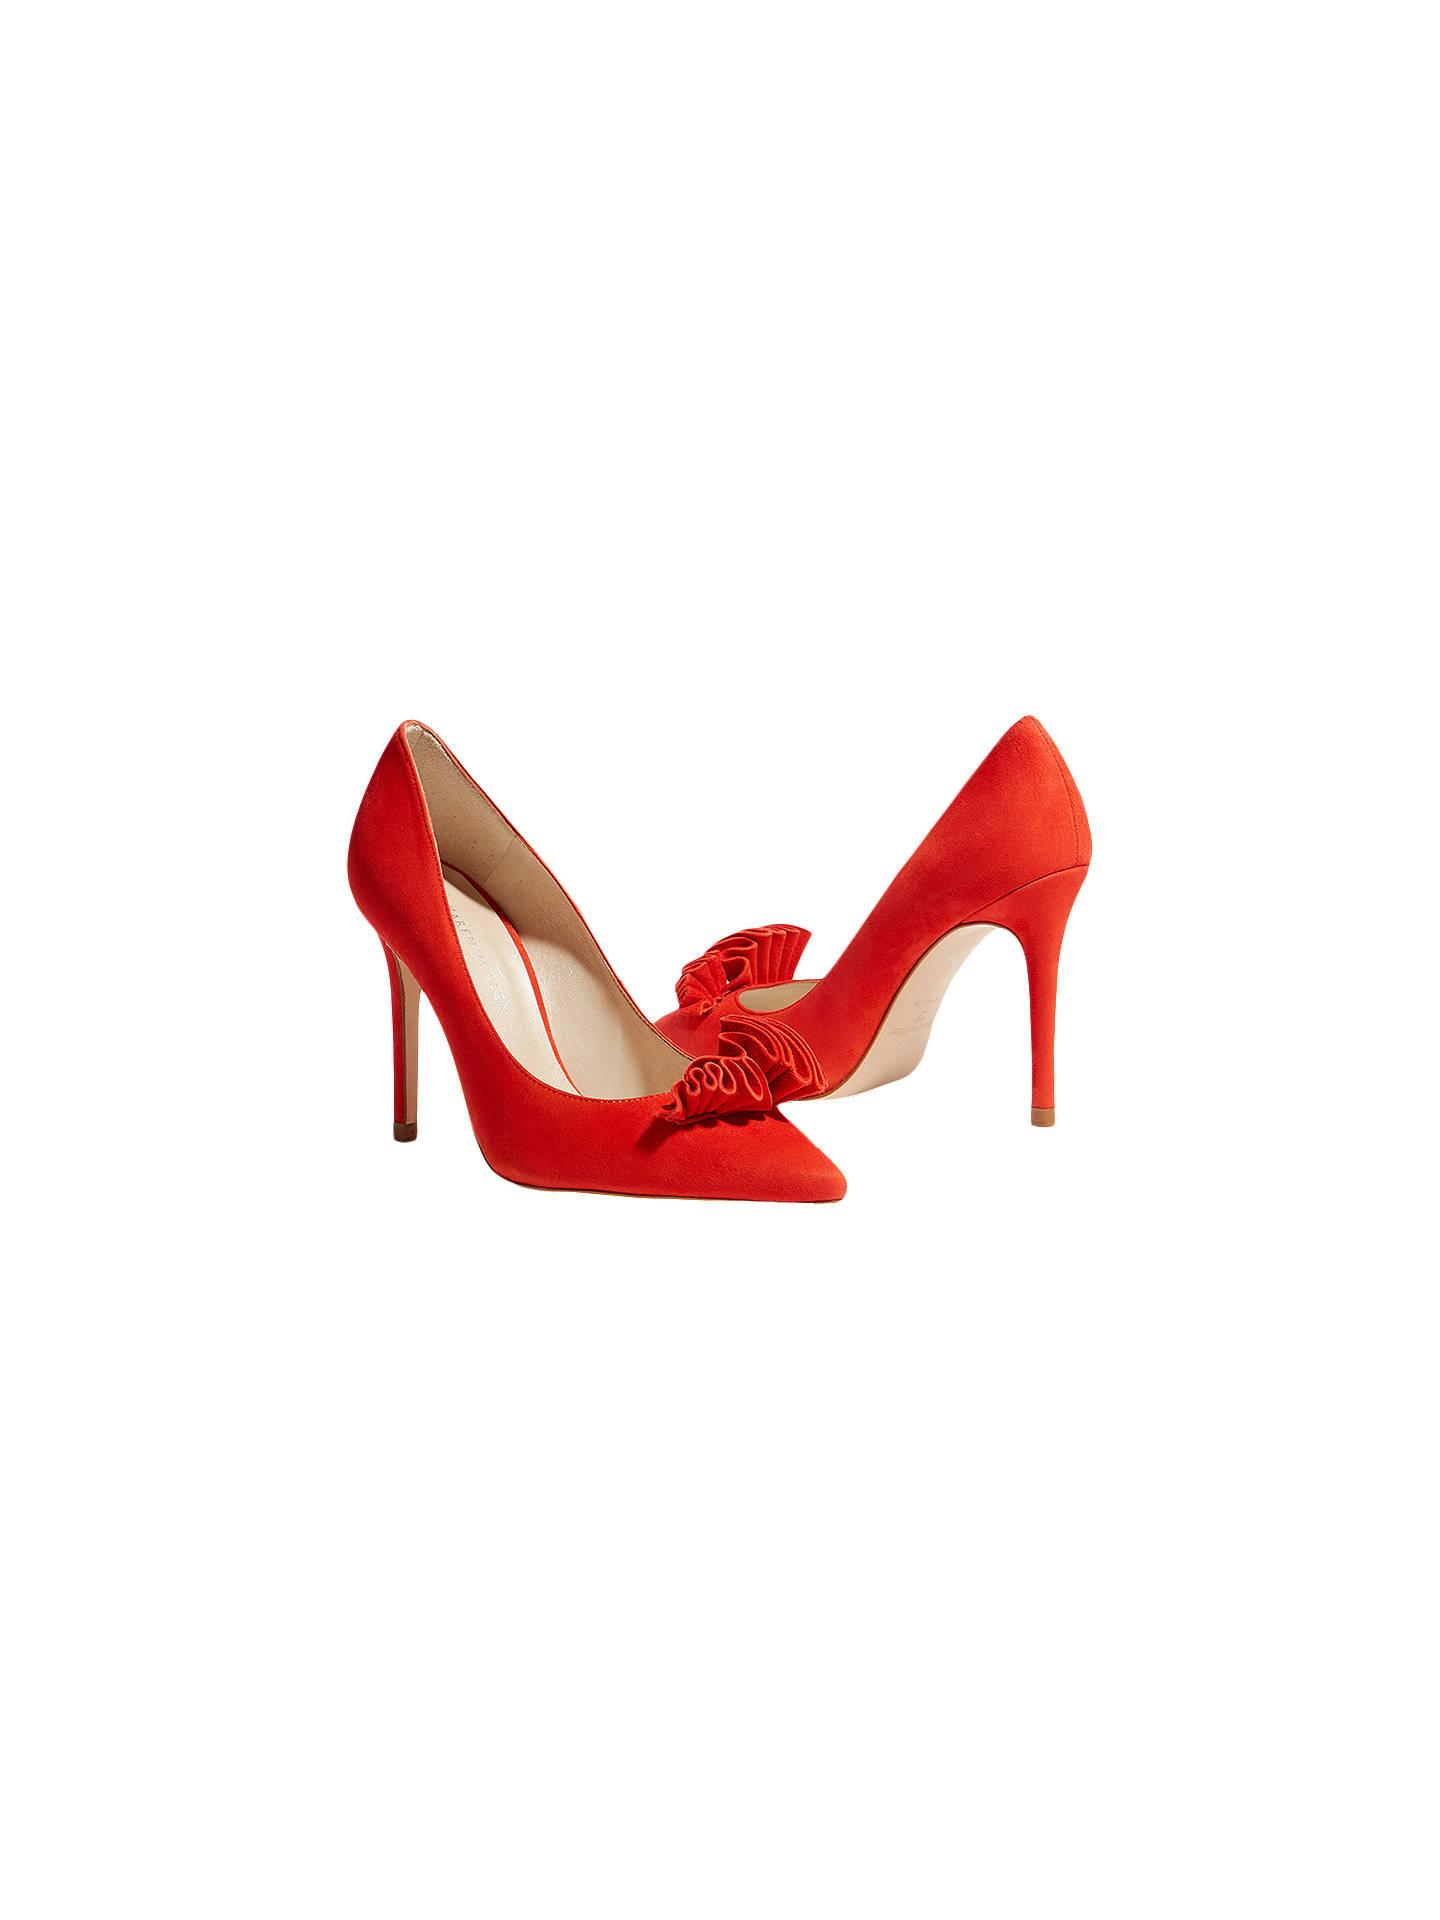 5f24a88e2c9 Karen Millen Stiletto Heel Frill Court Shoes, Red Suede at John ...